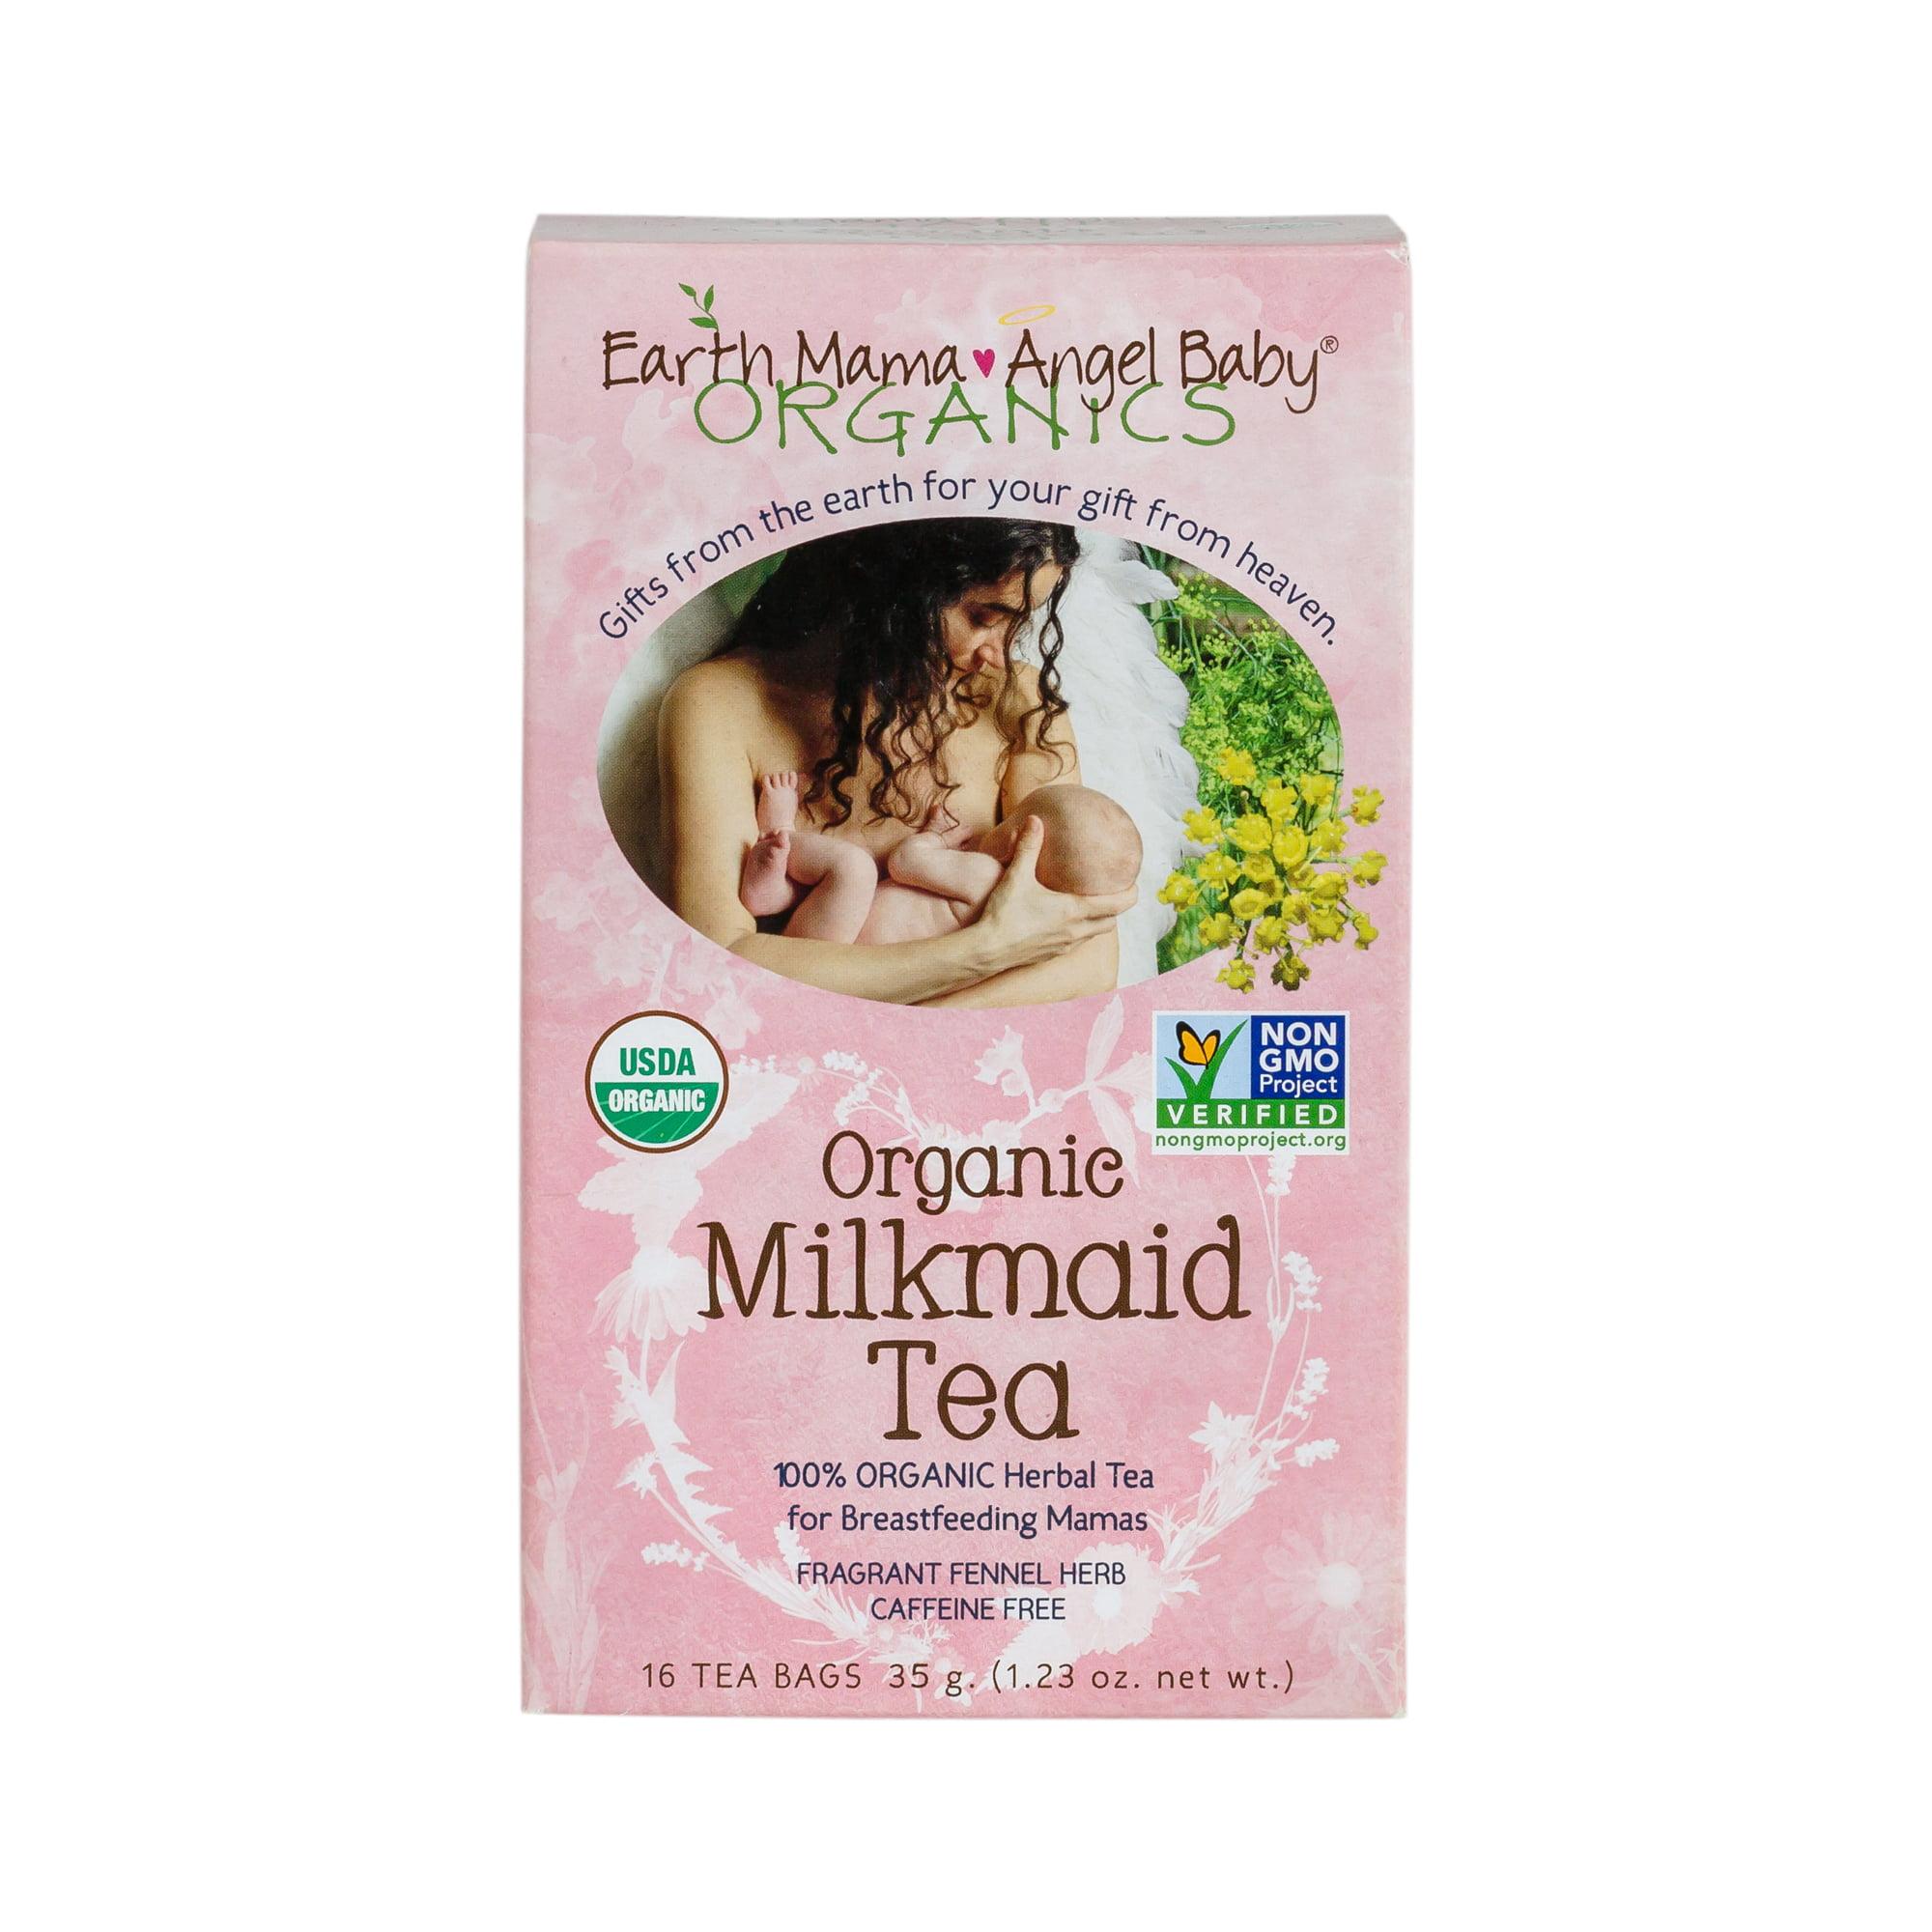 Earth Mama Angel Baby Organics Organic Milkmaid Tea - 16 CT